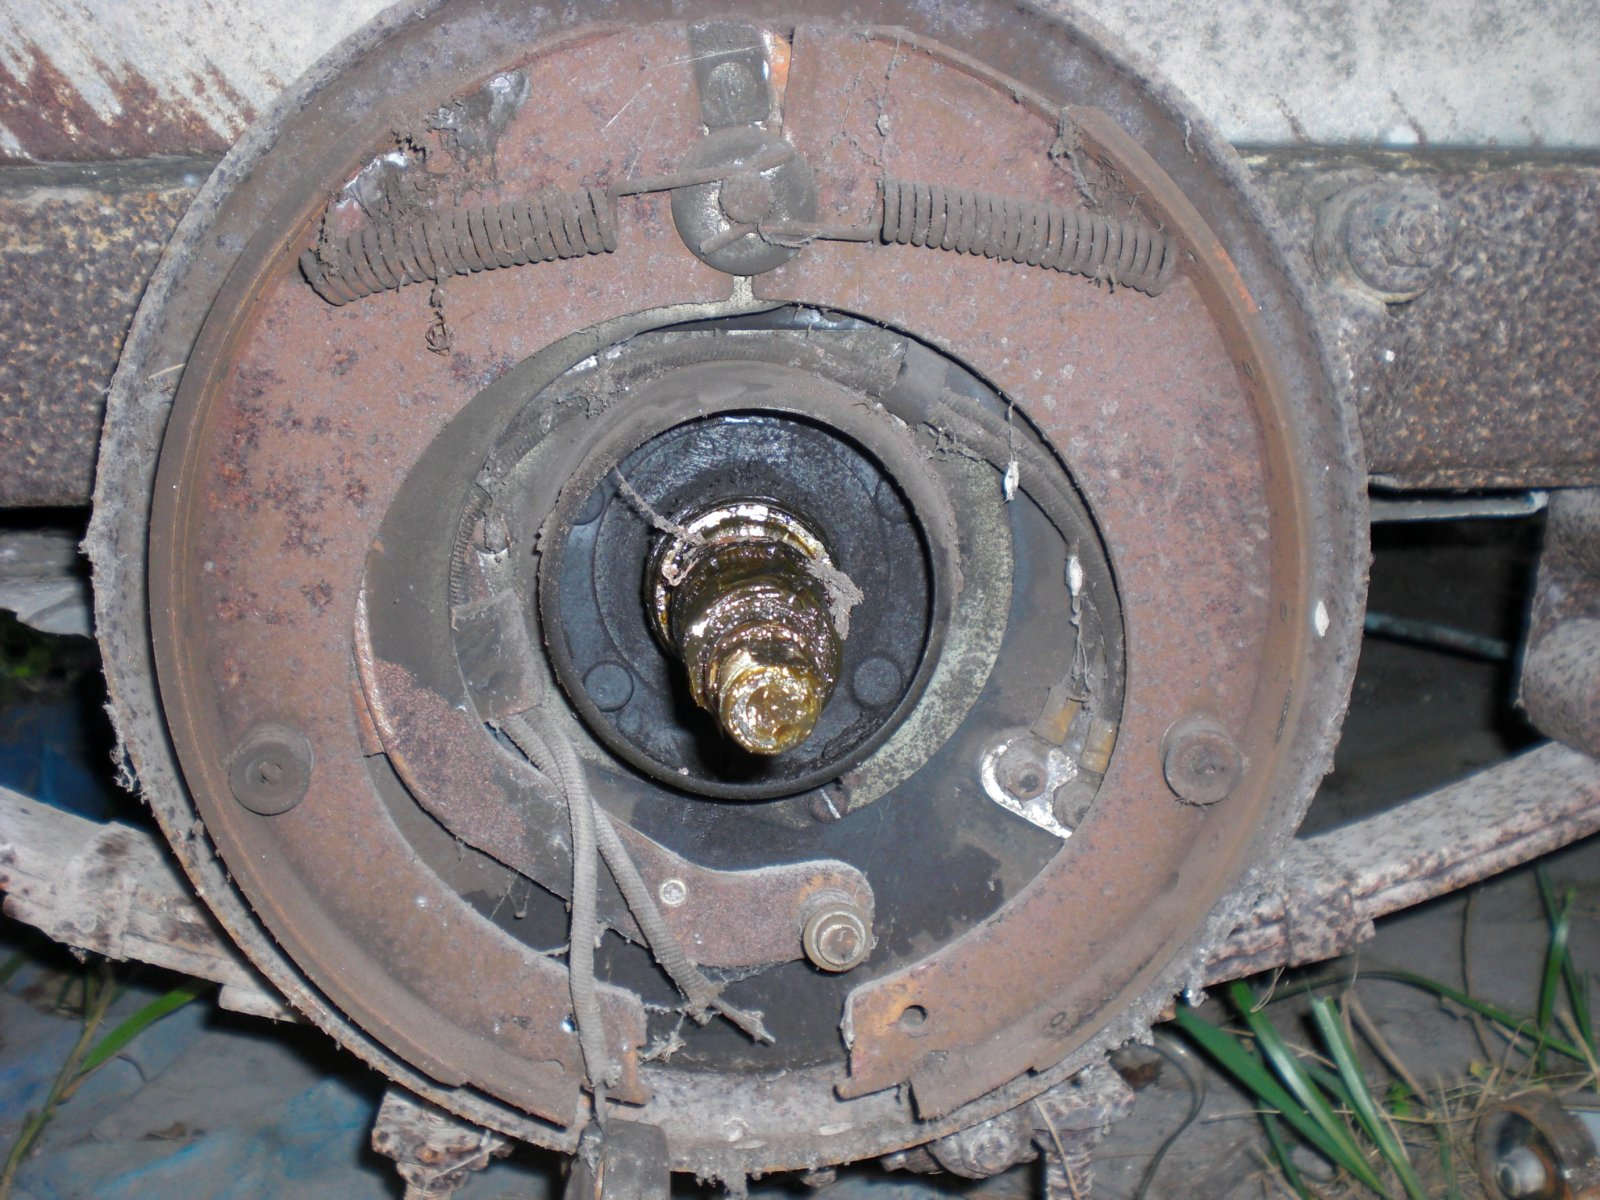 Click image for larger version  Name:brake parts2.jpg Views:74 Size:368.6 KB ID:73664